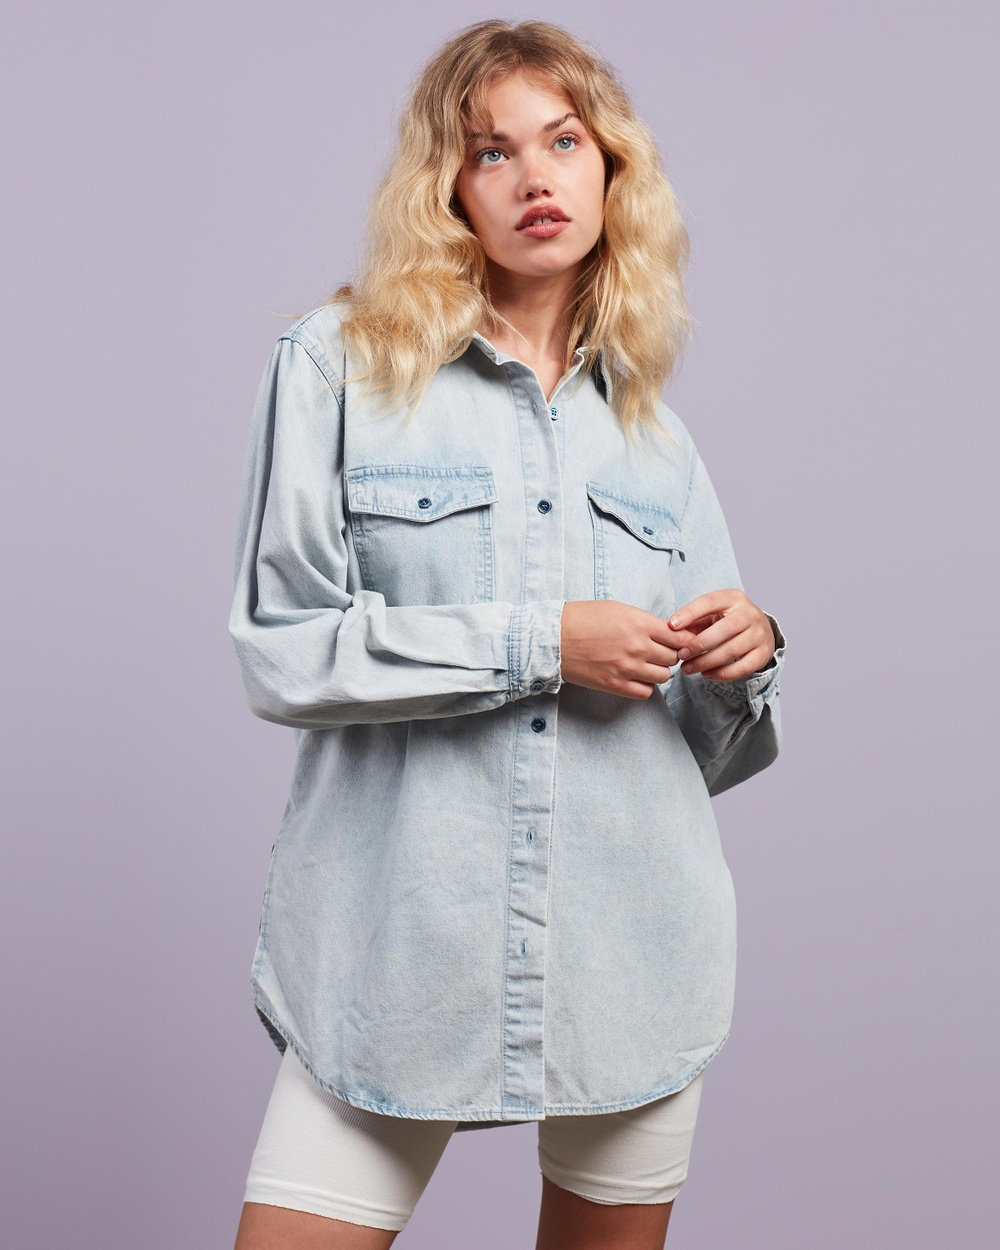 Missguided Boyfriend Fit Oversized Denim Shirt Tops Blue Australia